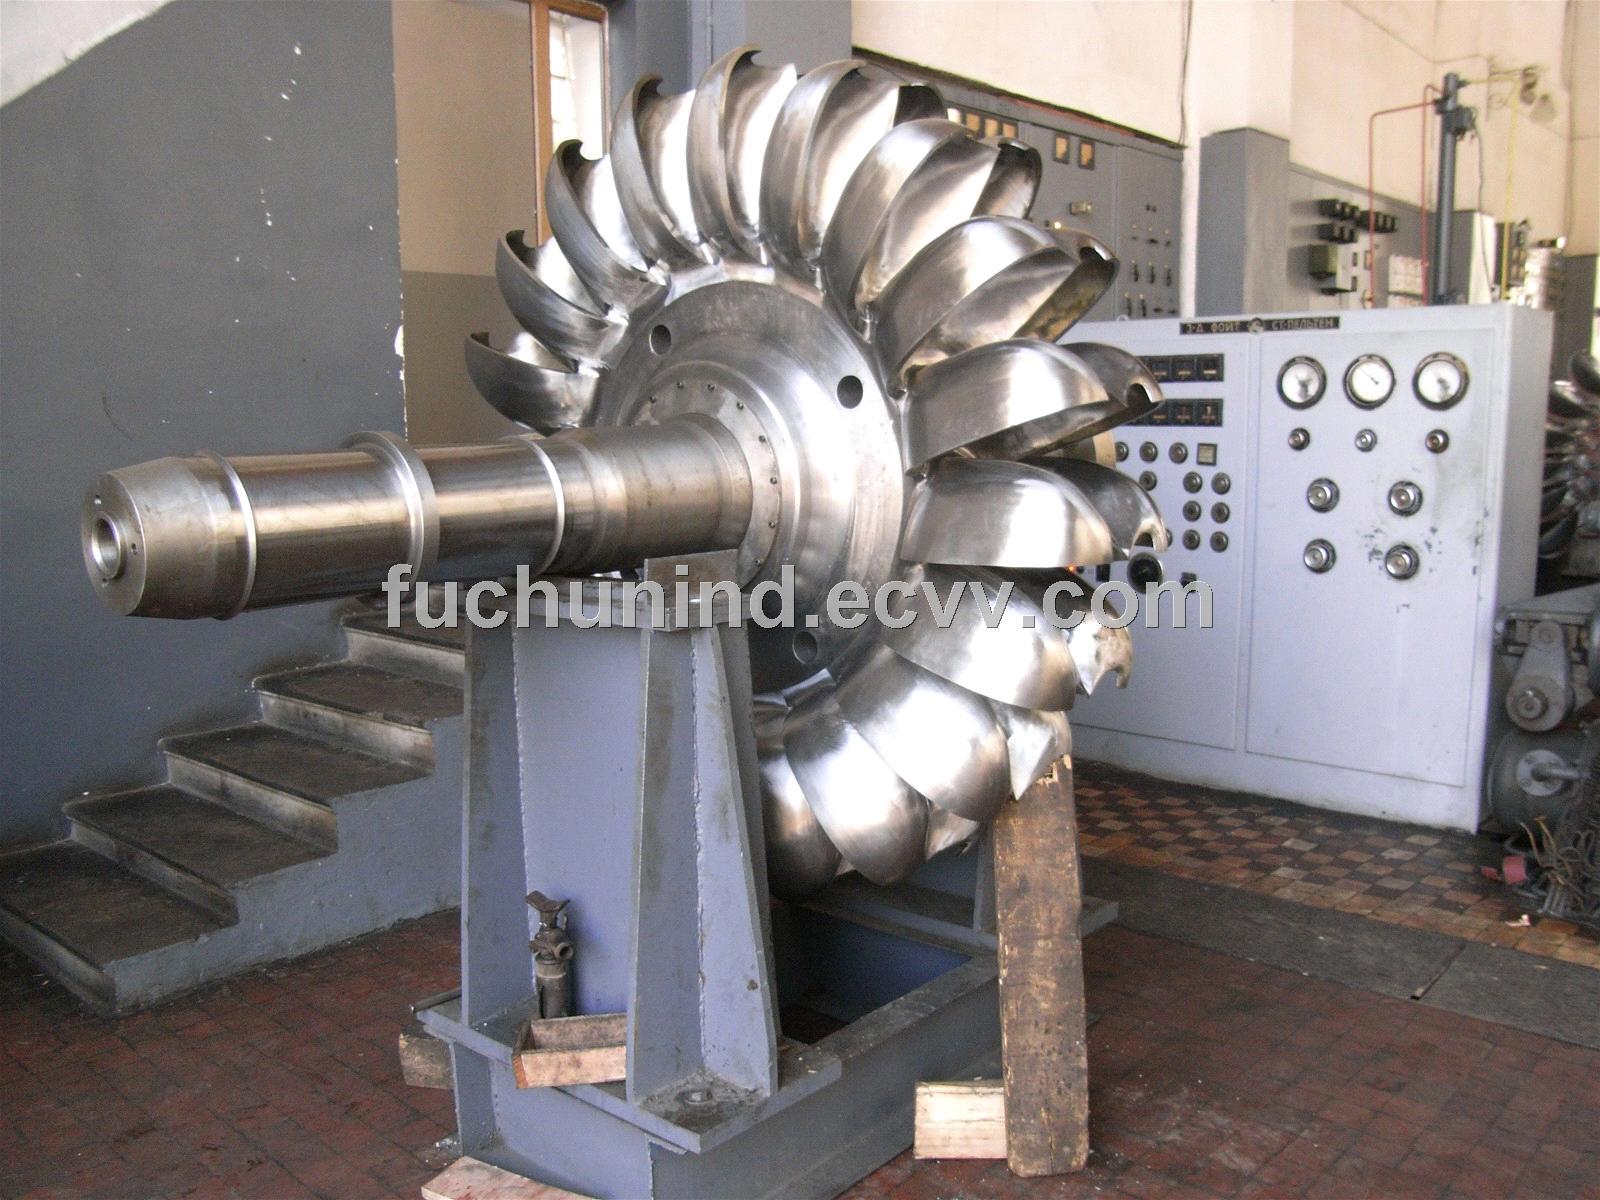 Pelton Turbine Water Turbine Hydro Turbine for Hydro Power